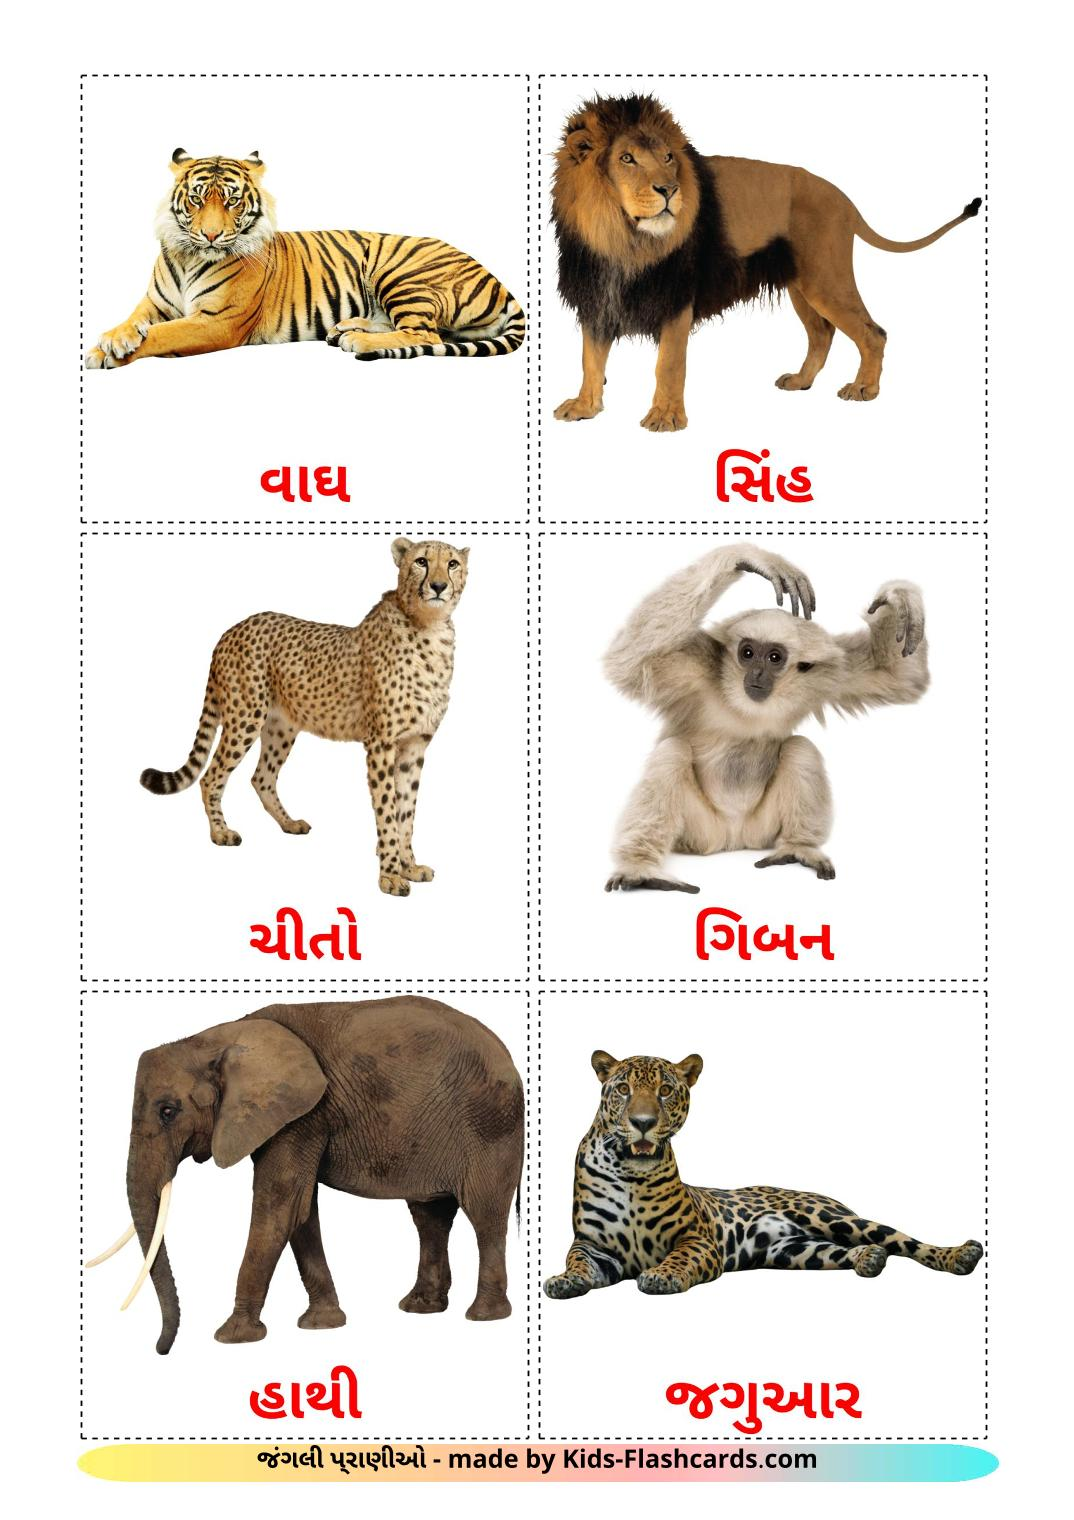 Jungle animals - 21 Free Printable gujarati Flashcards